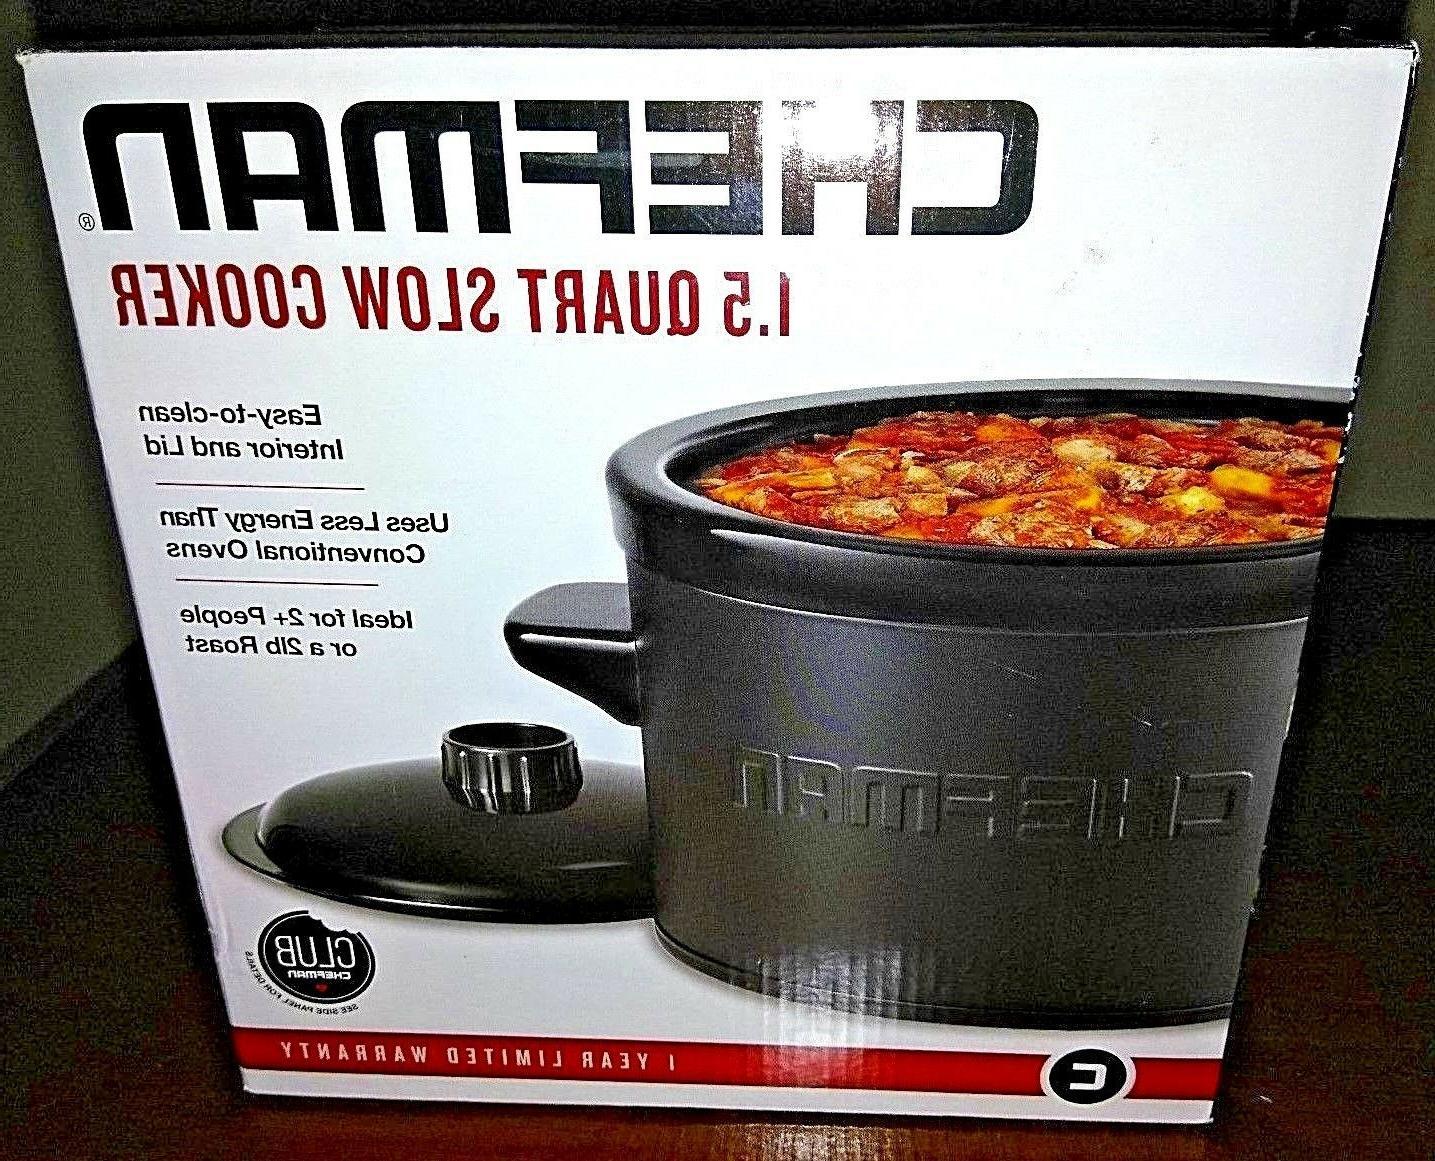 slow cooker 1 5 quart ideal